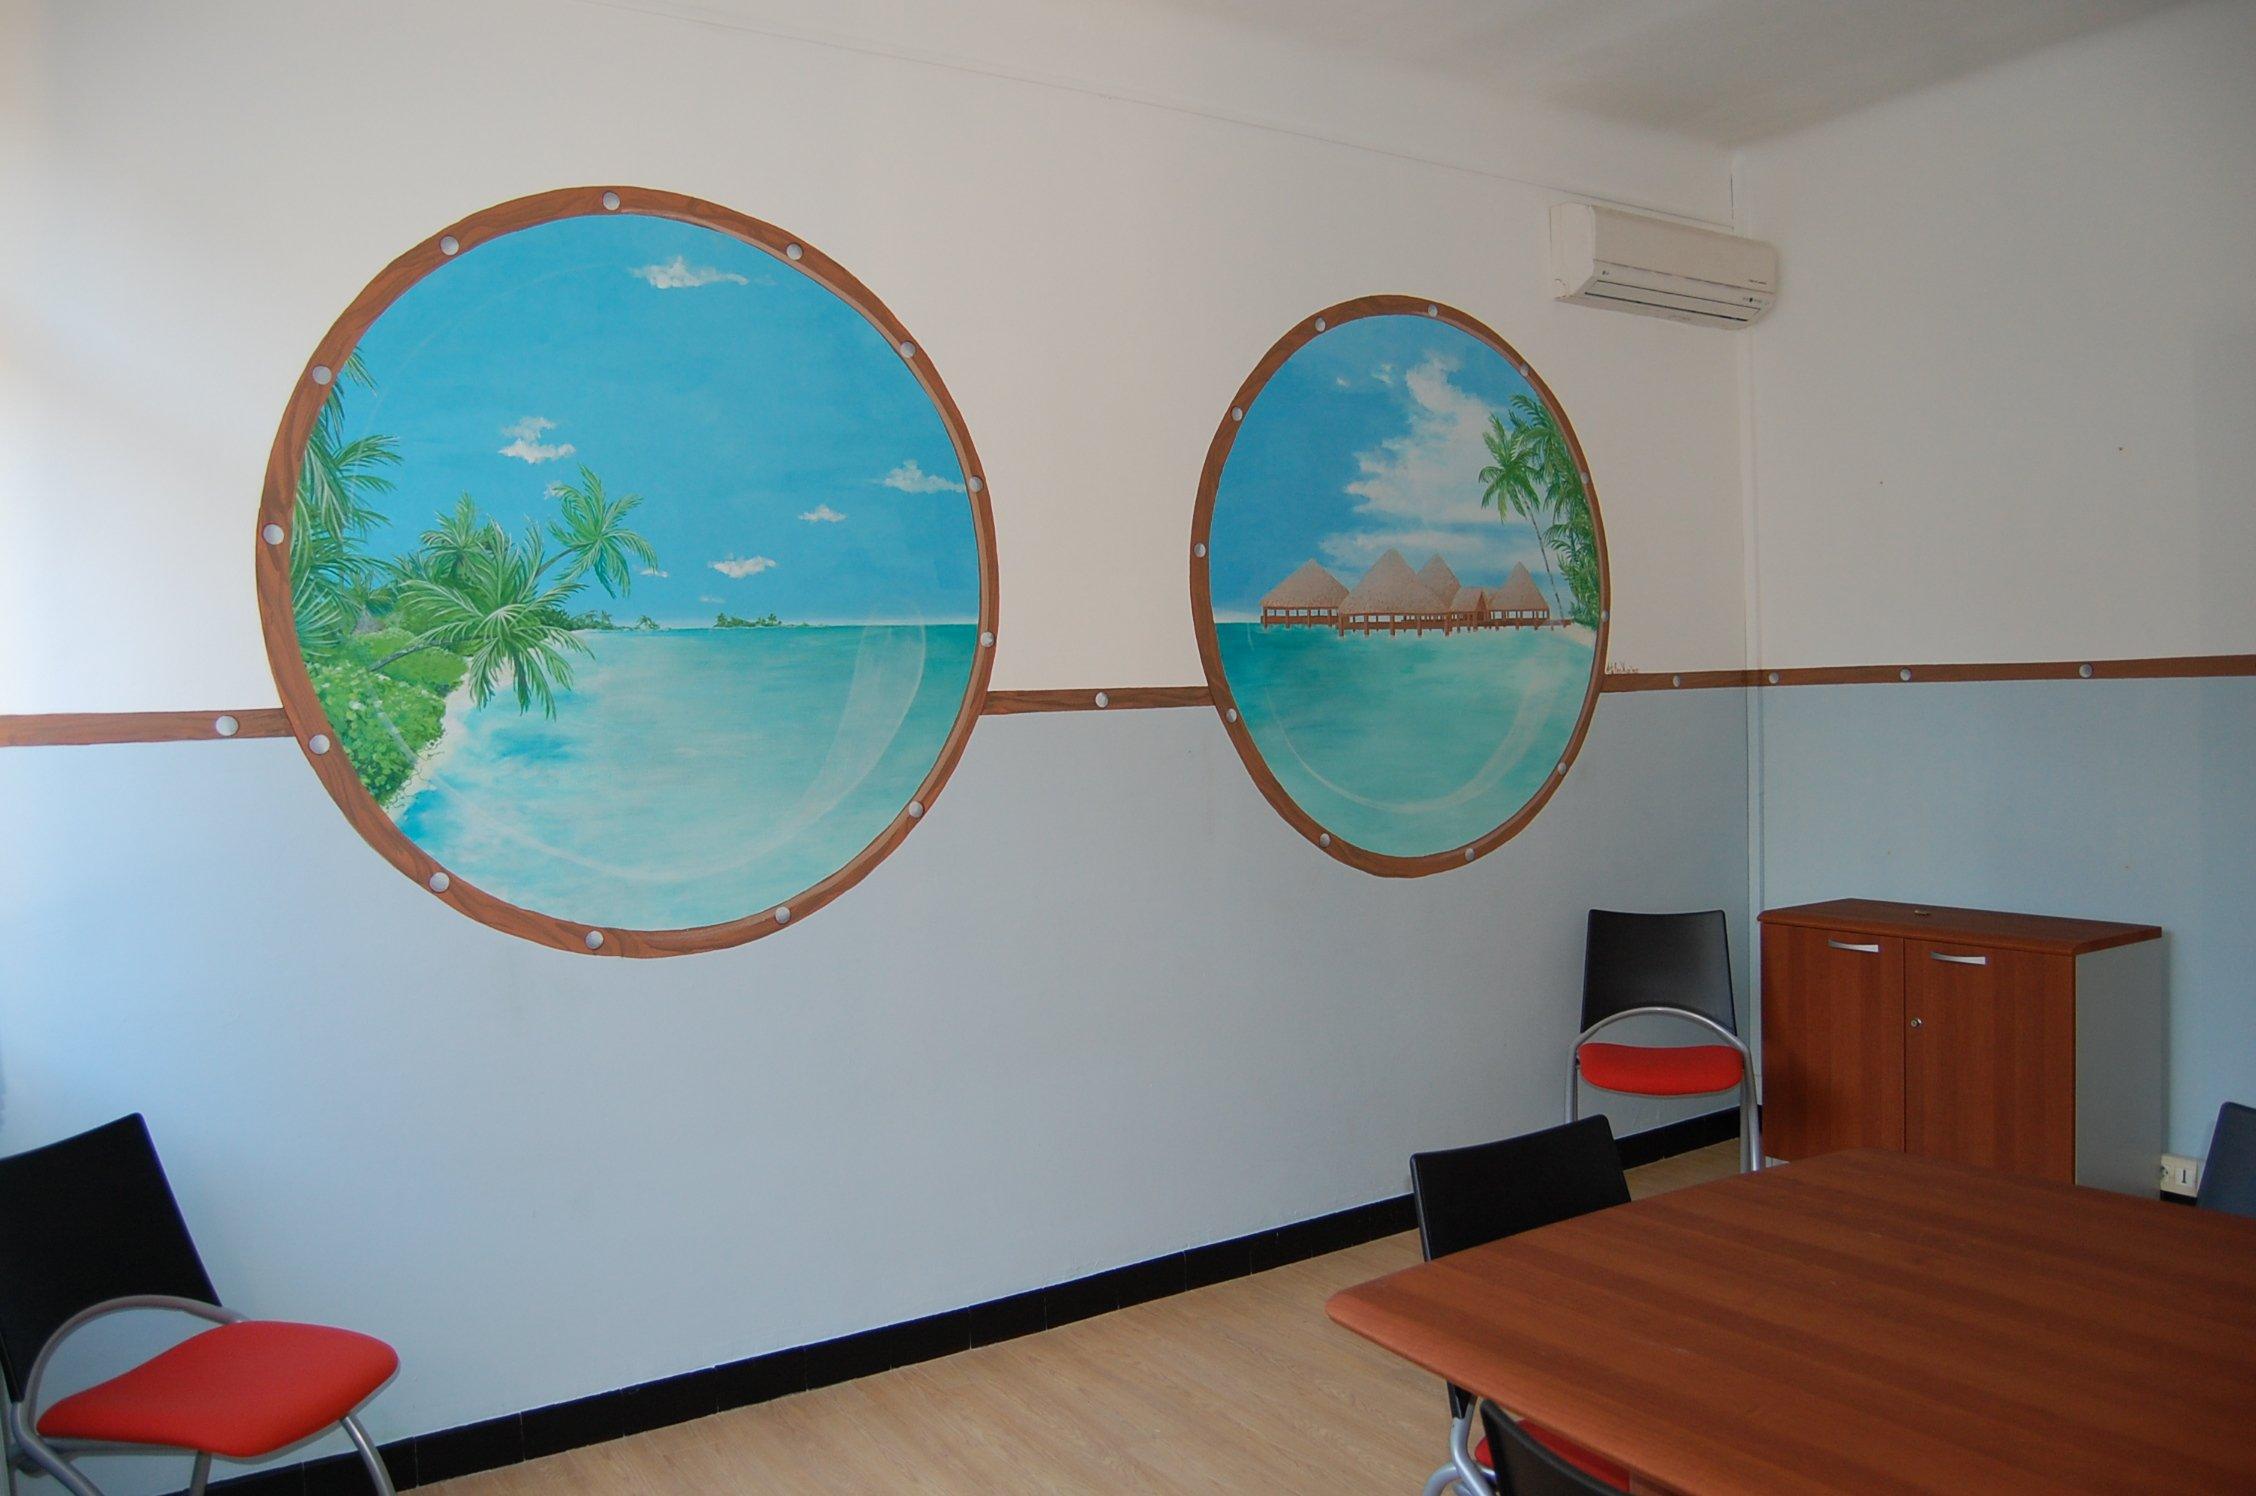 atelier mur 39 mur. Black Bedroom Furniture Sets. Home Design Ideas